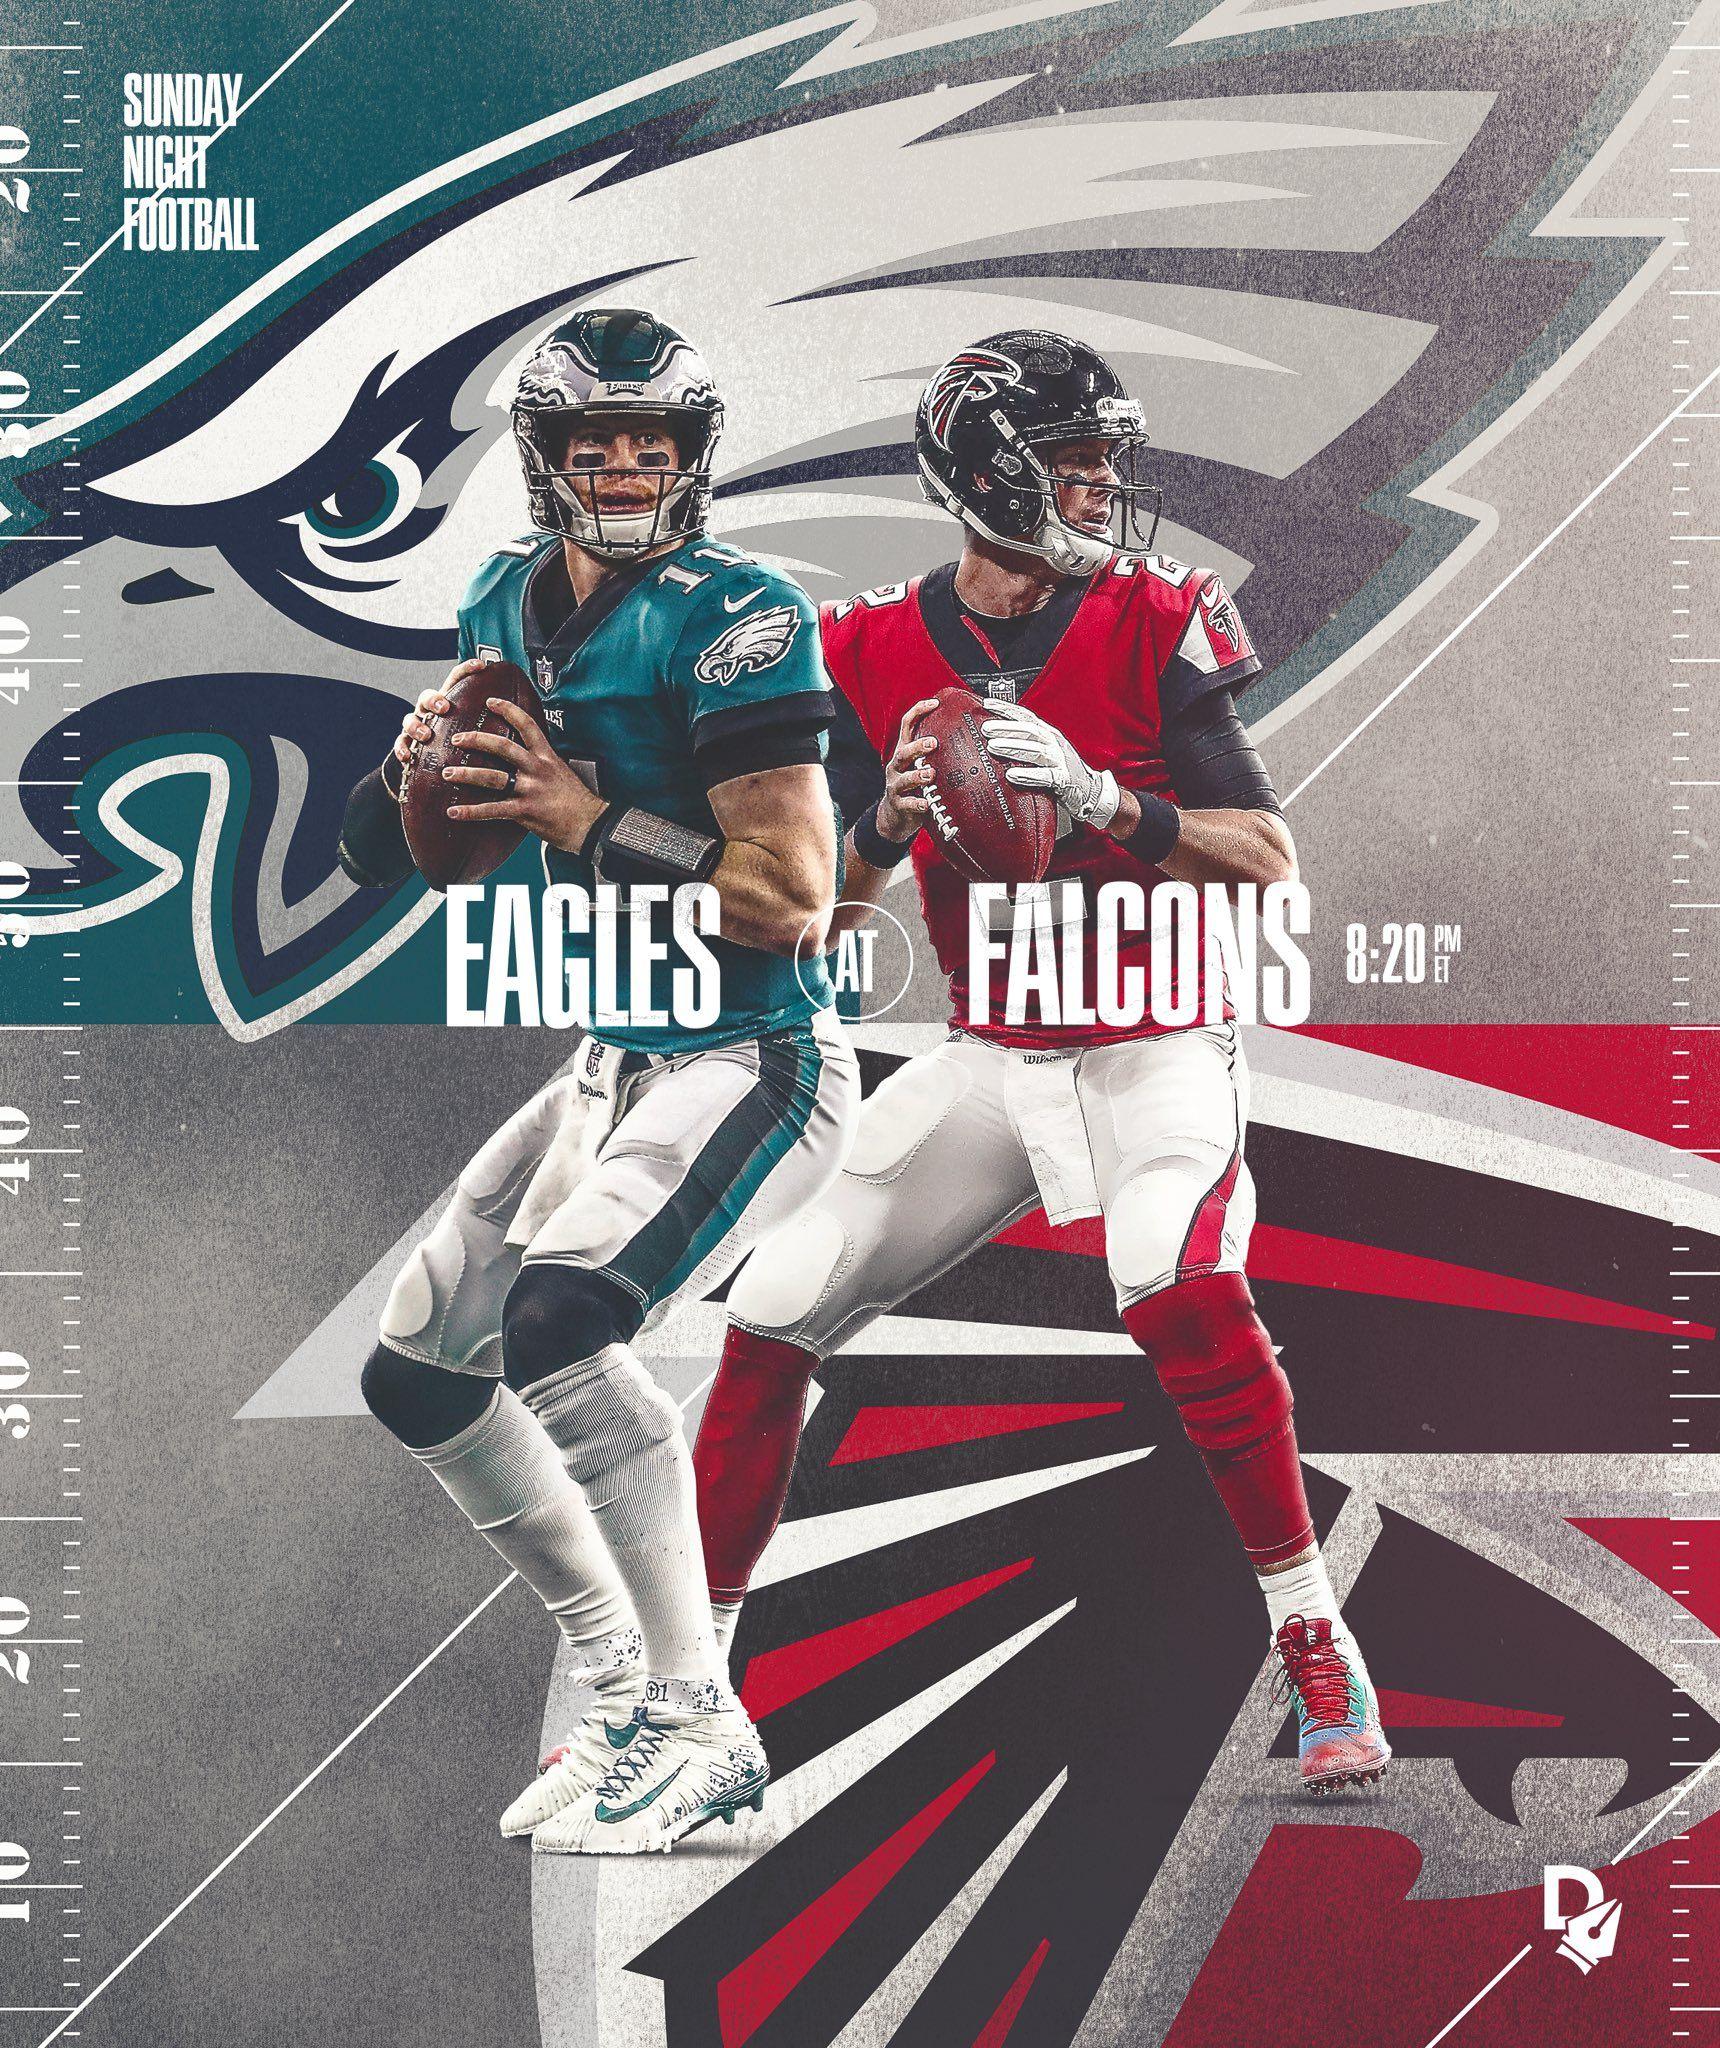 Johnny Silva On Twitter Football Poster Sports Design Inspiration Sunday Night Football